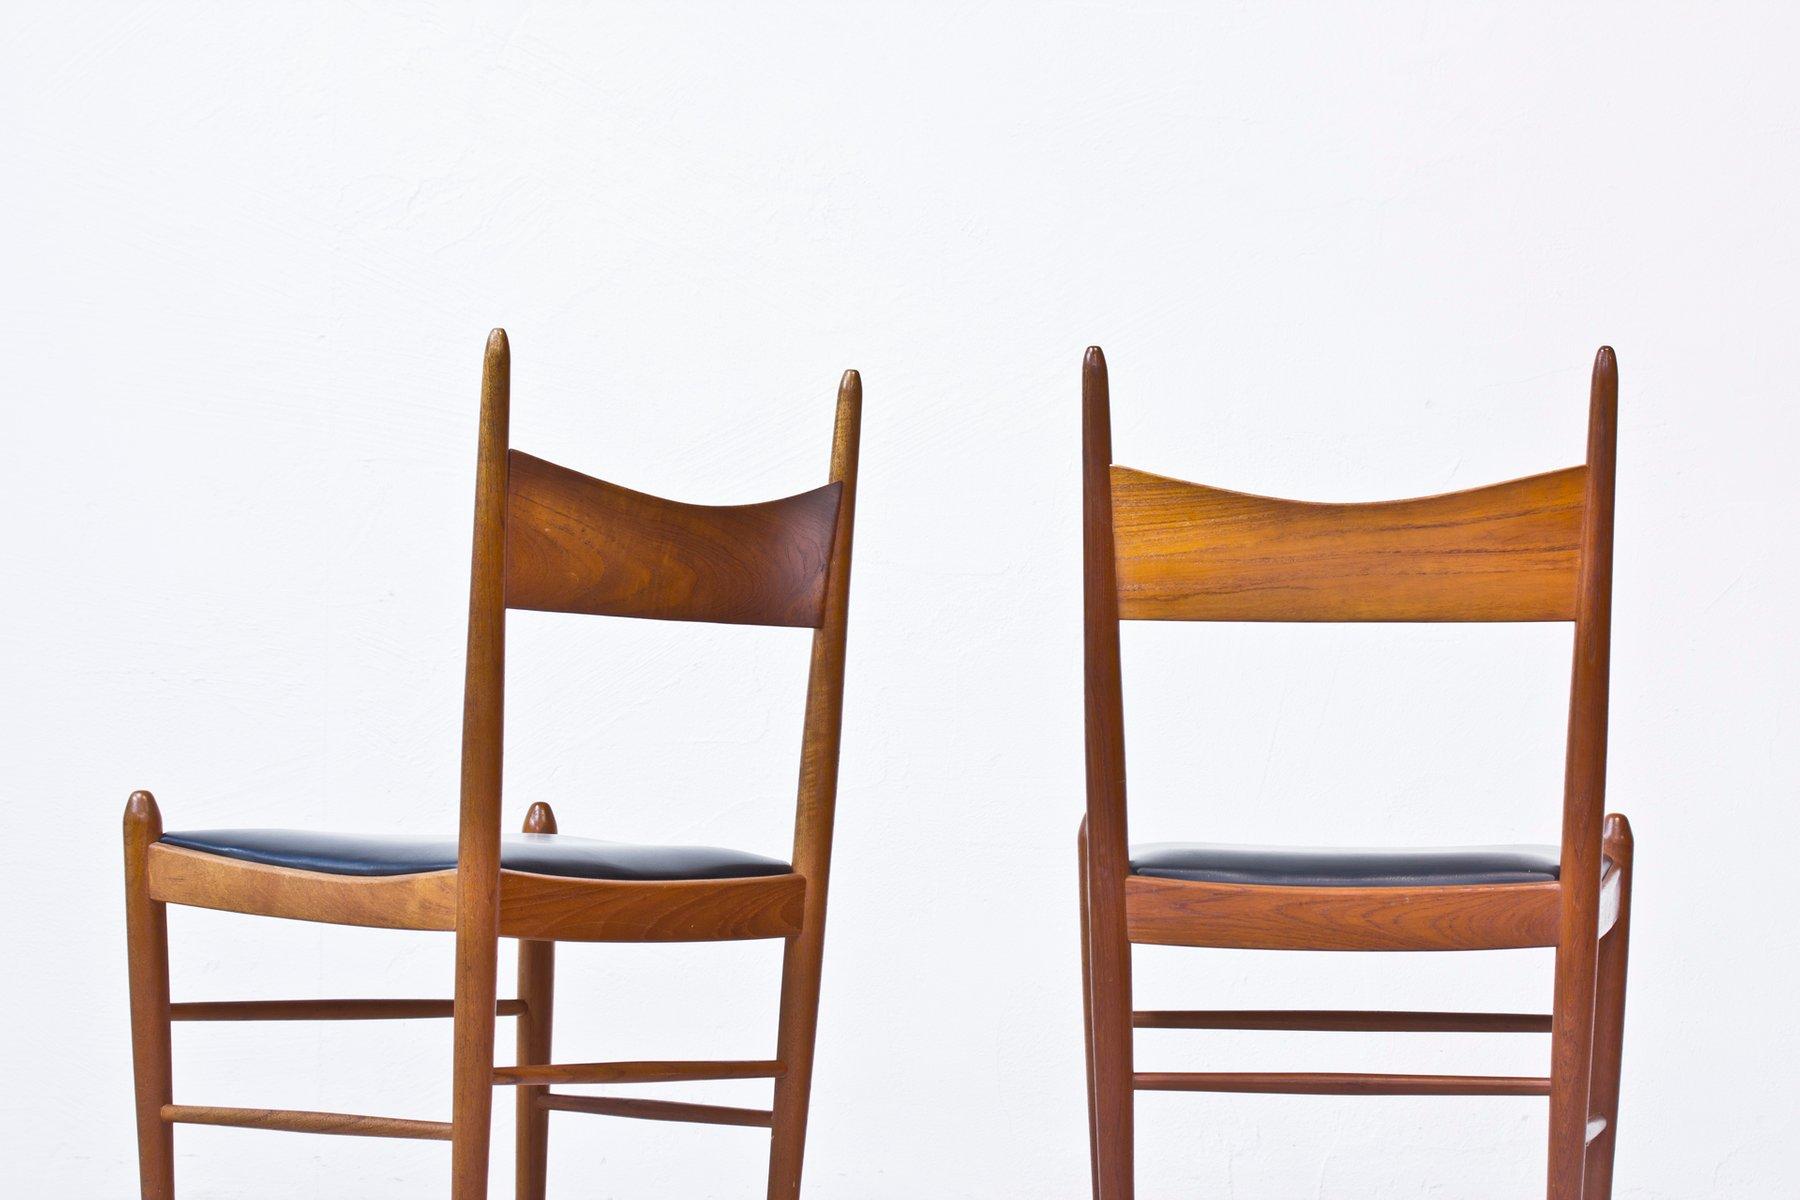 teak esszimmerst hle von illum wikkels f r br derna. Black Bedroom Furniture Sets. Home Design Ideas